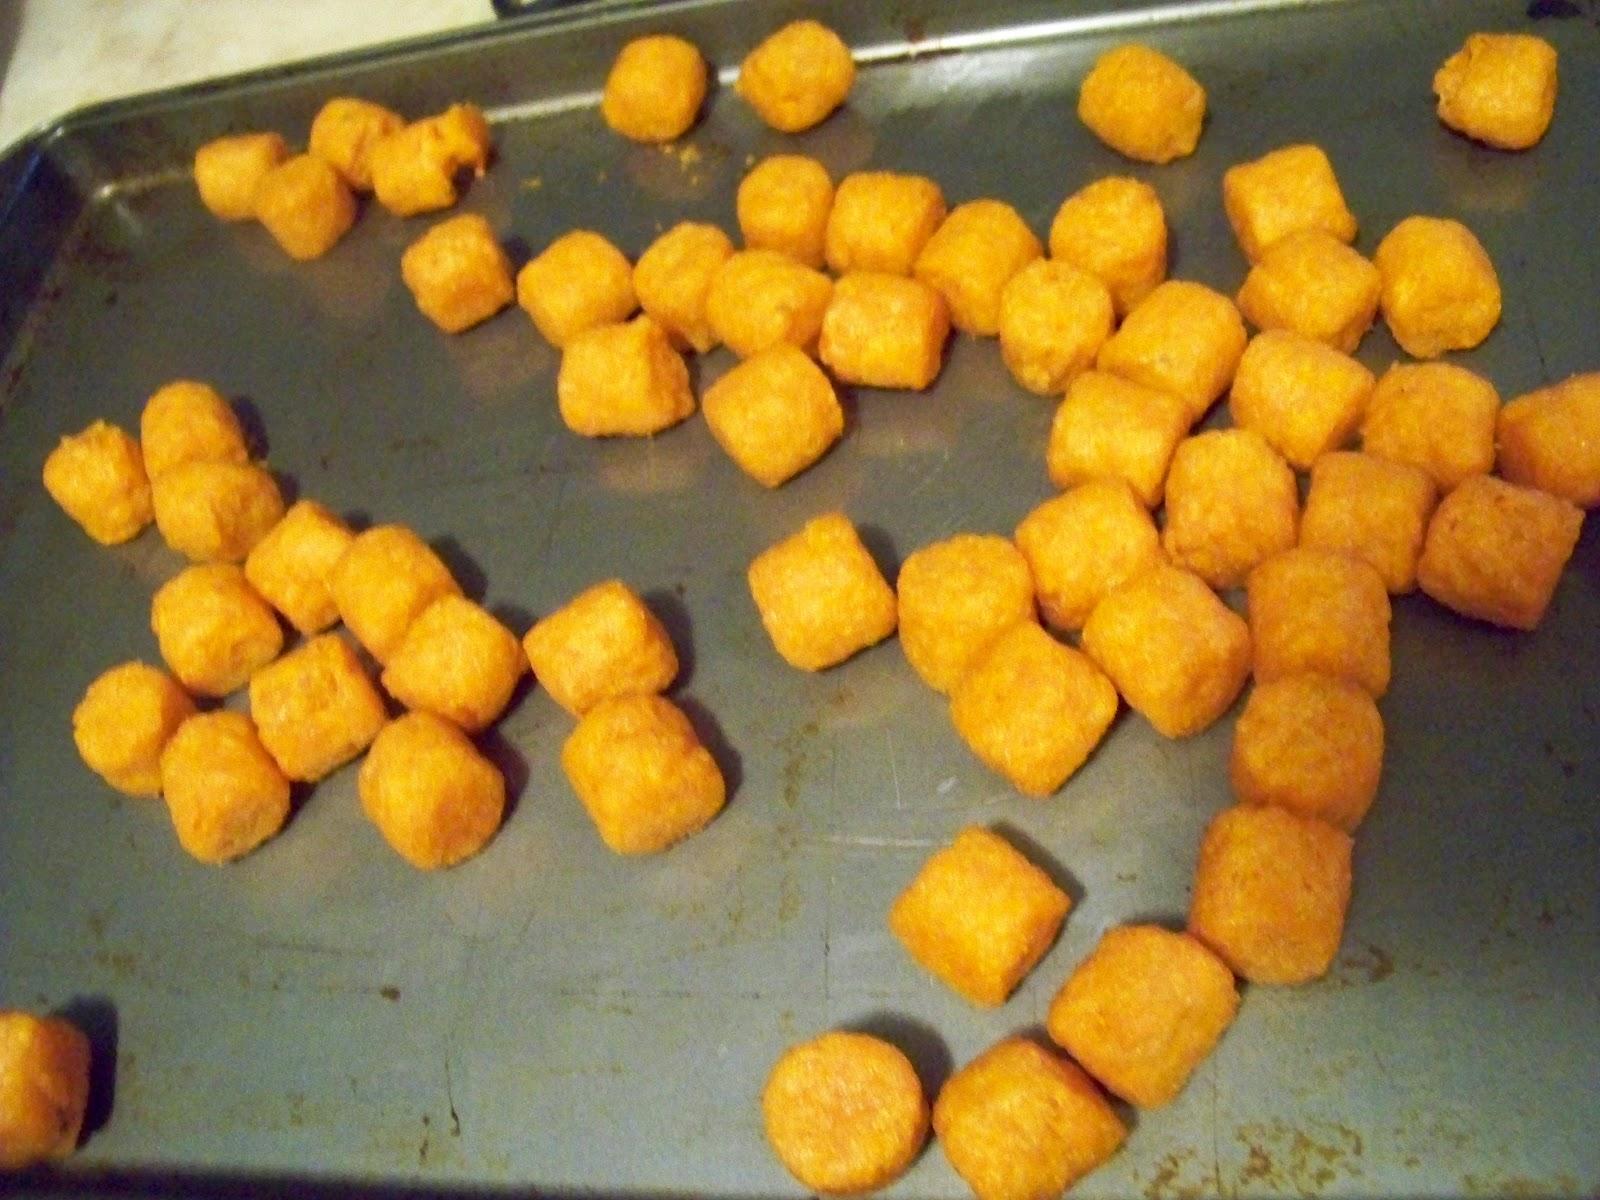 The Sweet Potato Puffs are simple to bake. The Sweet Potato Puffs take ...